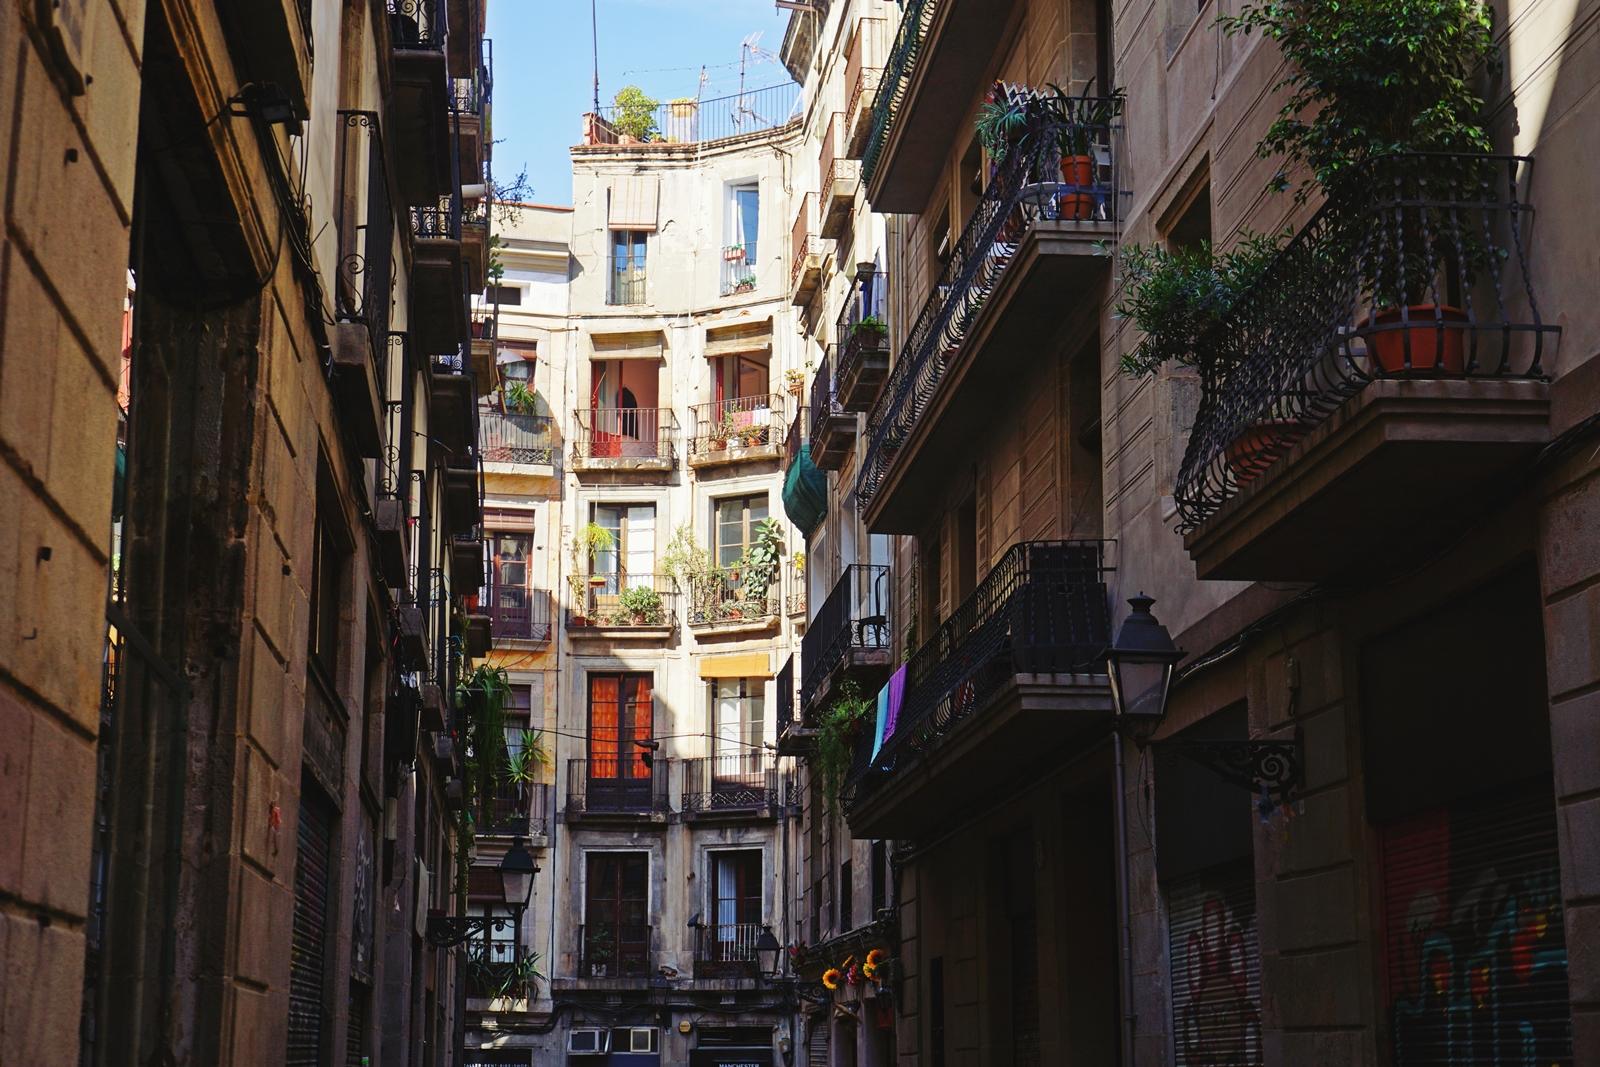 Barcelone, Espagne, 2017